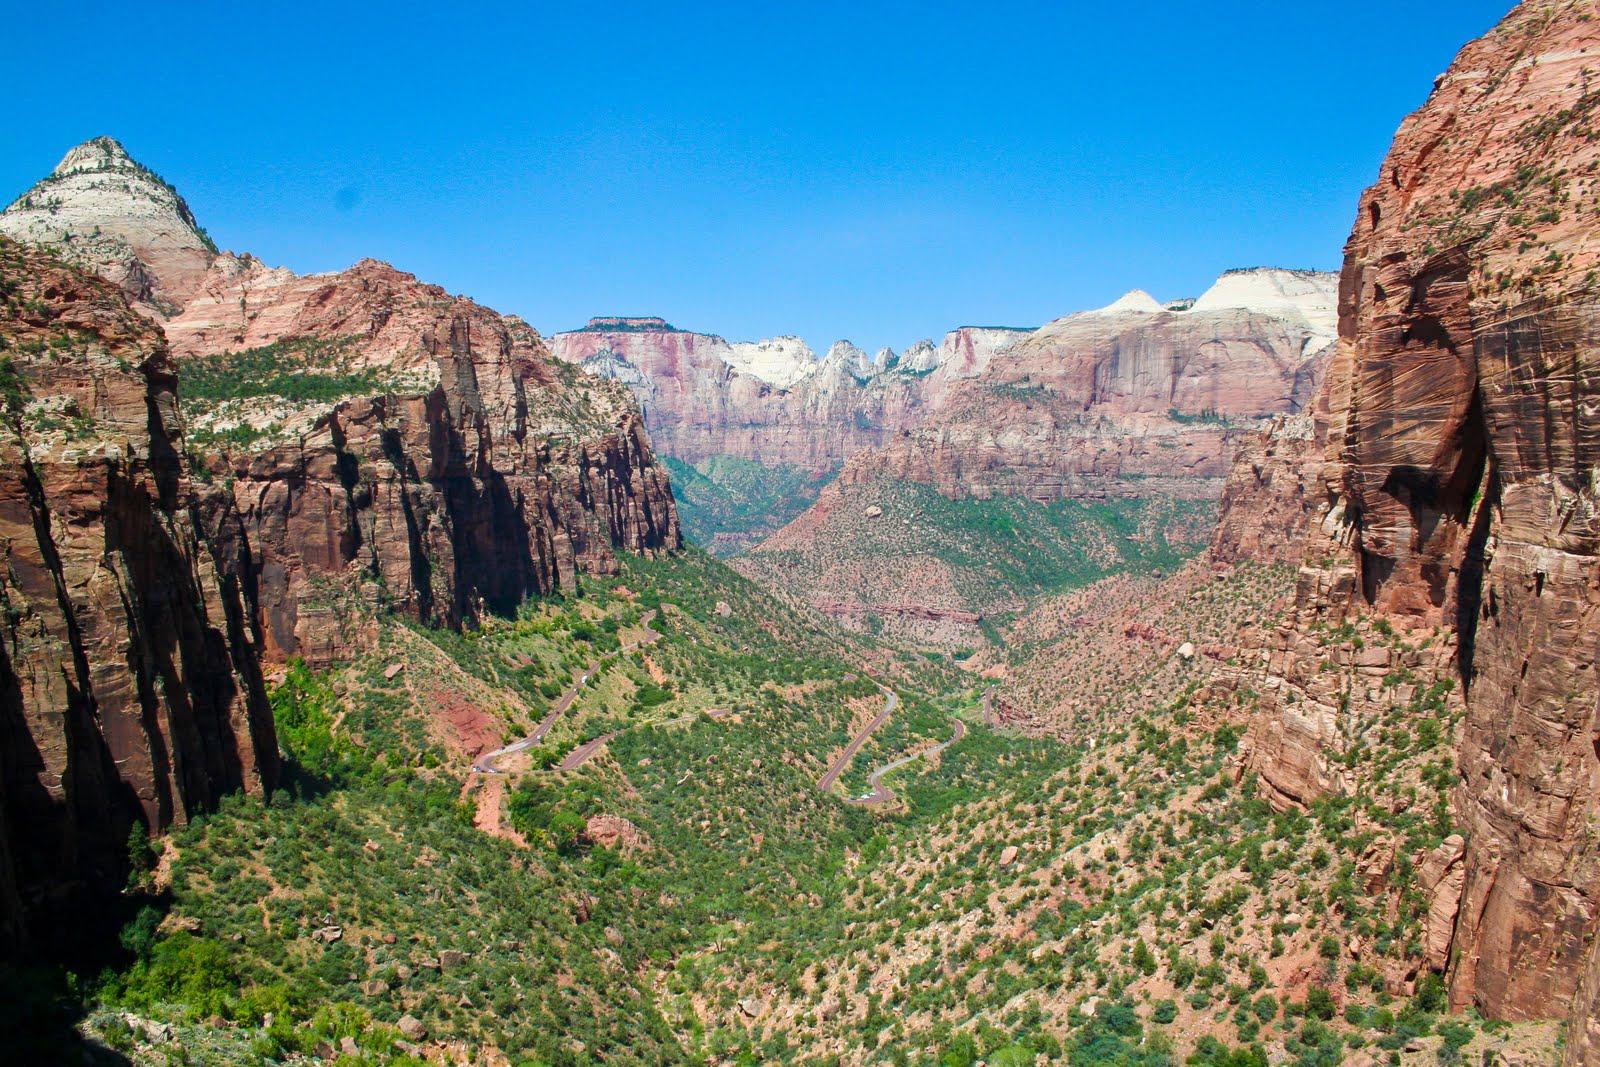 Angelyn's Photo Blog: Zion National Park, Emerald Pool ... | 1600 x 1067 jpeg 455kB